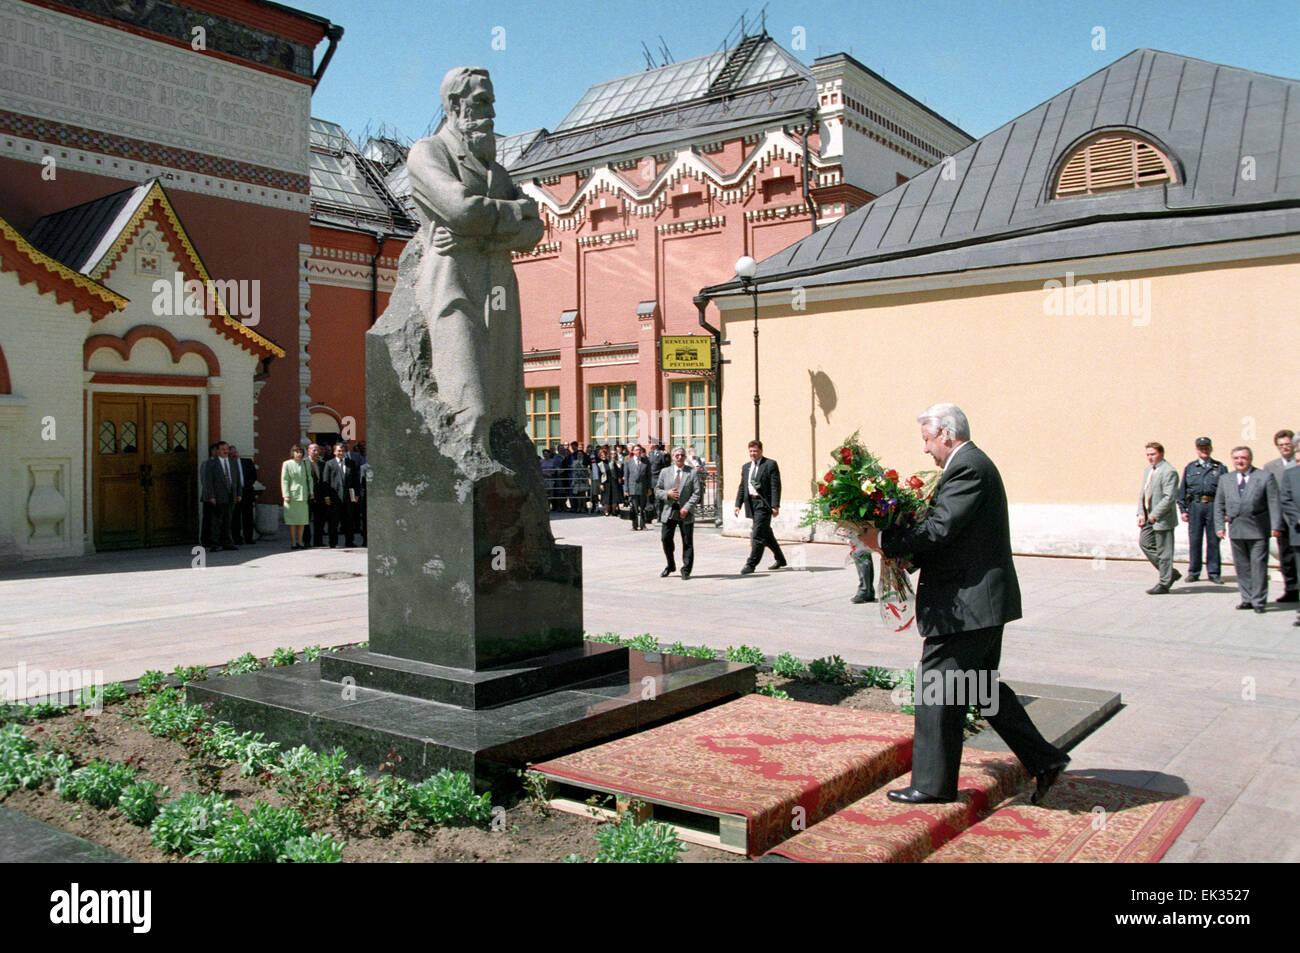 Monument to Boris Yeltsin will be installed in Yekaterinburg 03/25/2010 81